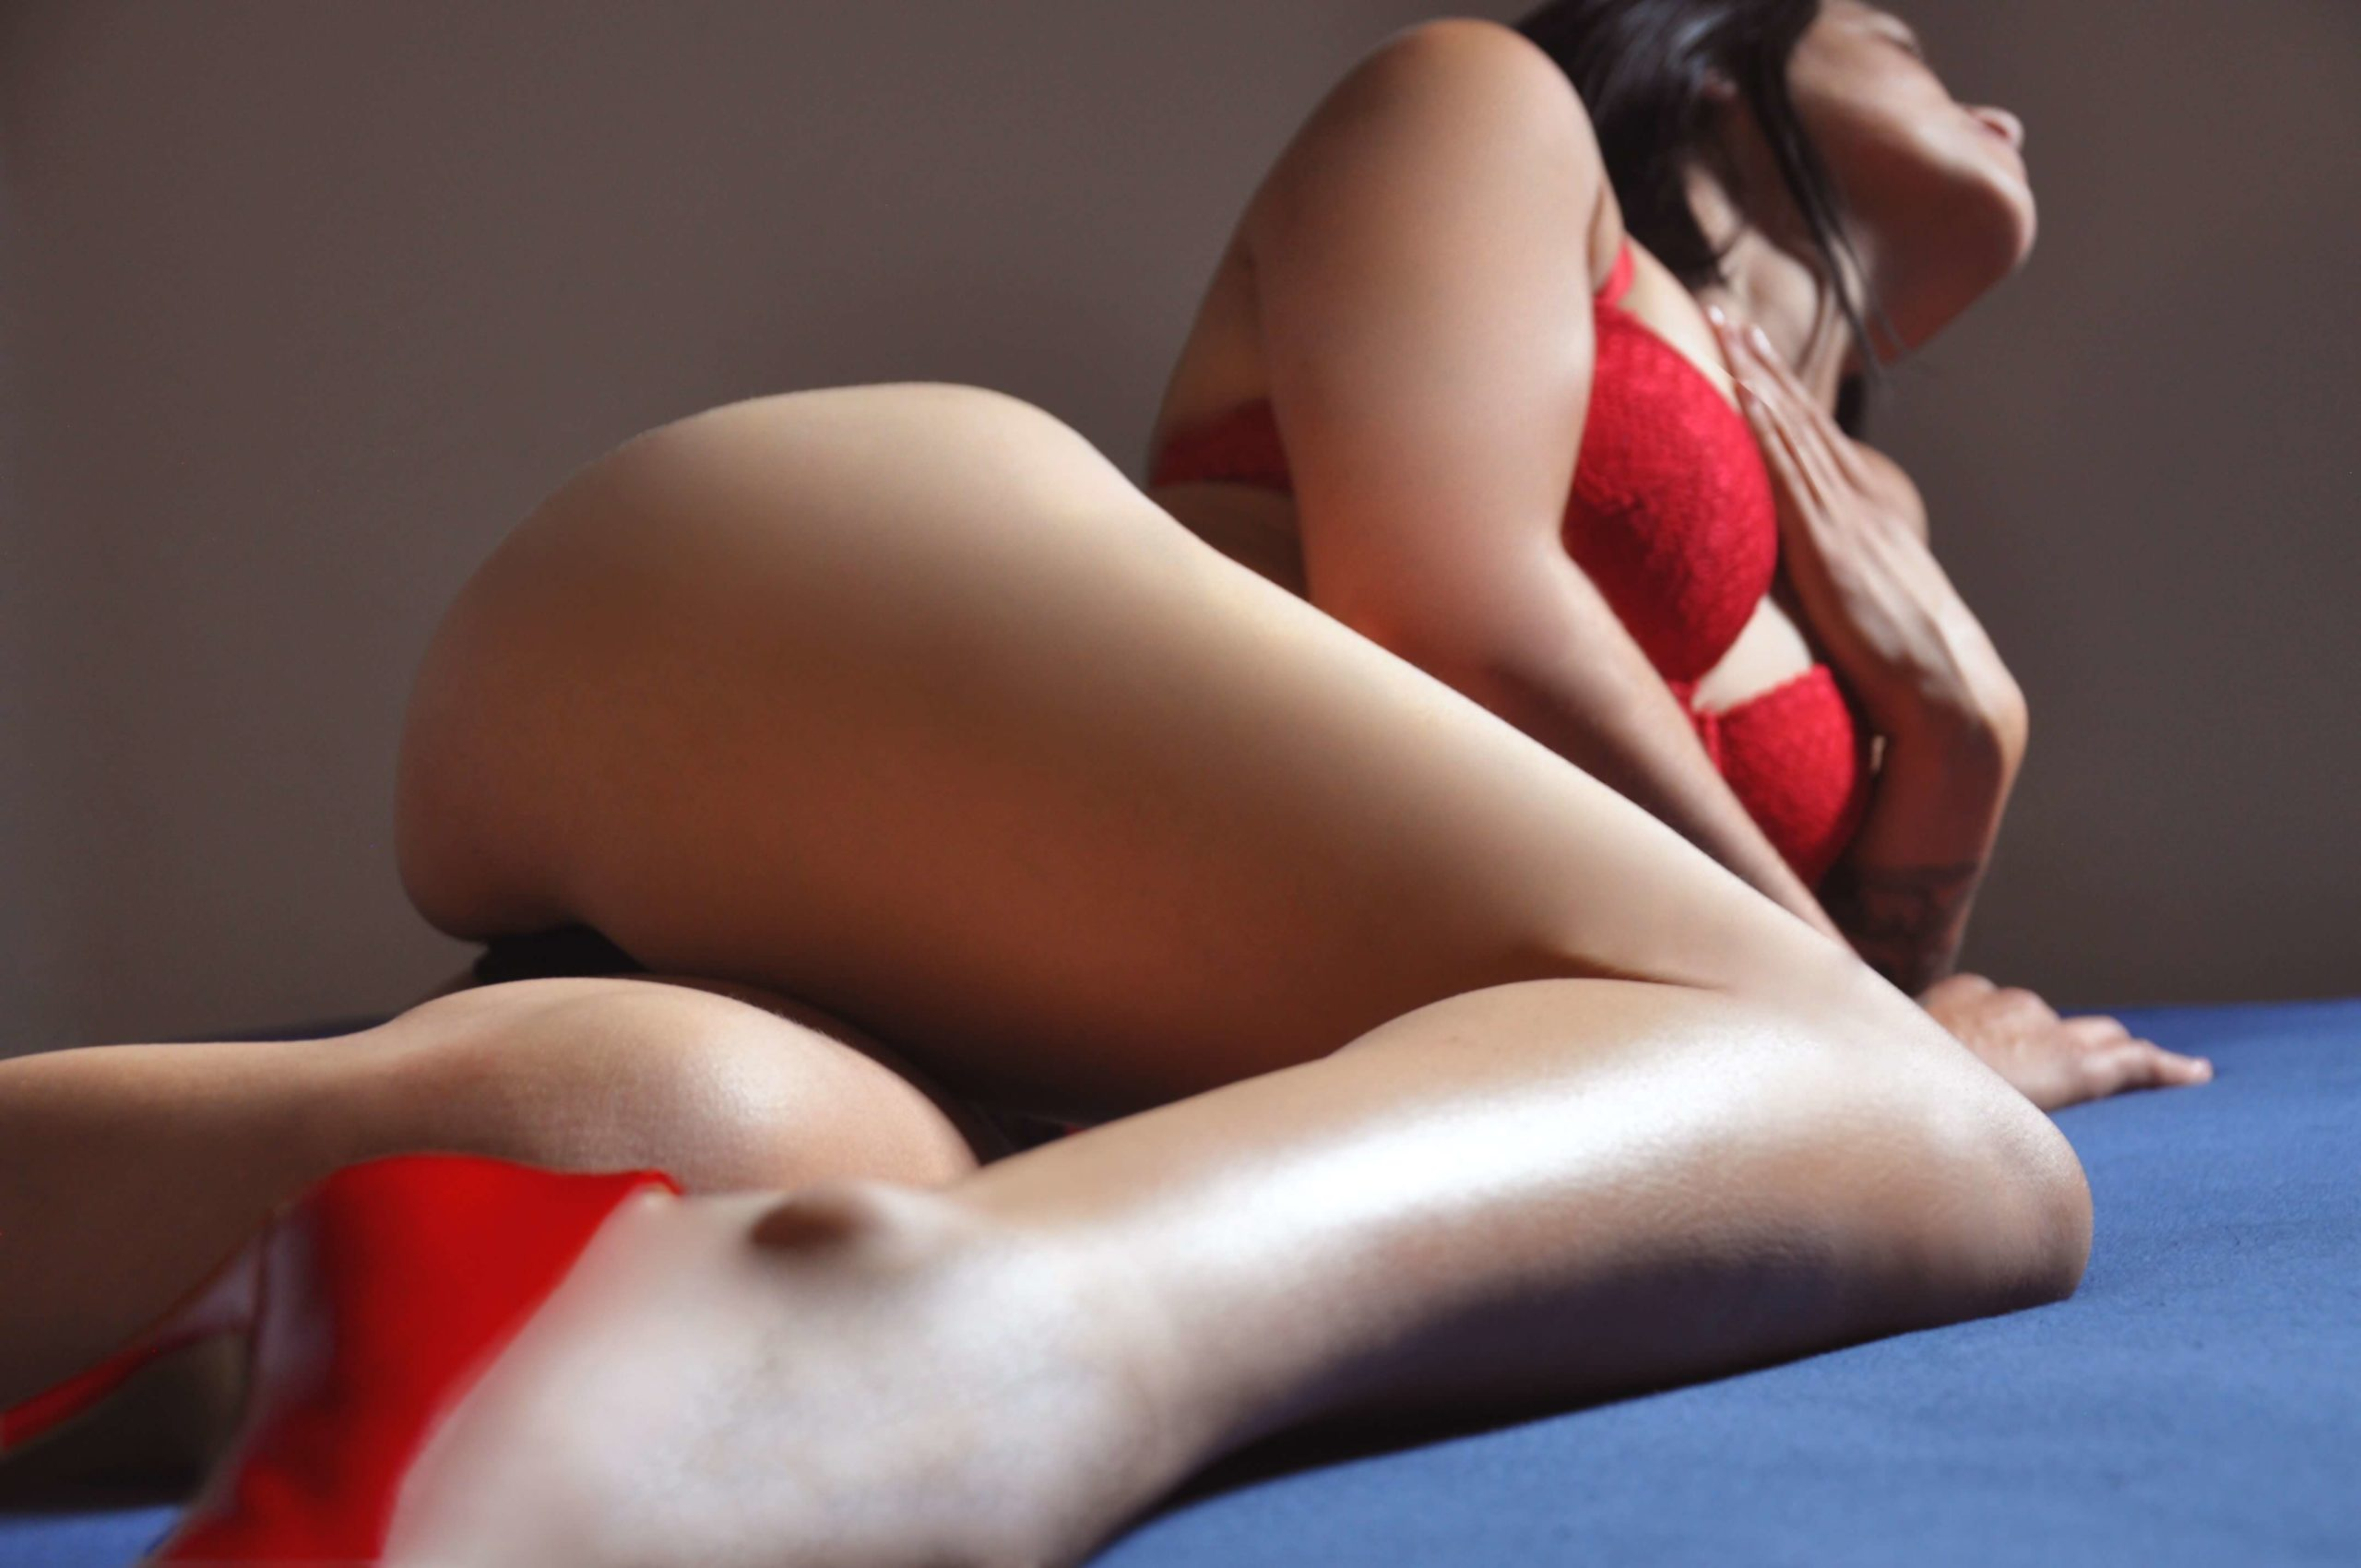 Bruna masseuse tantra